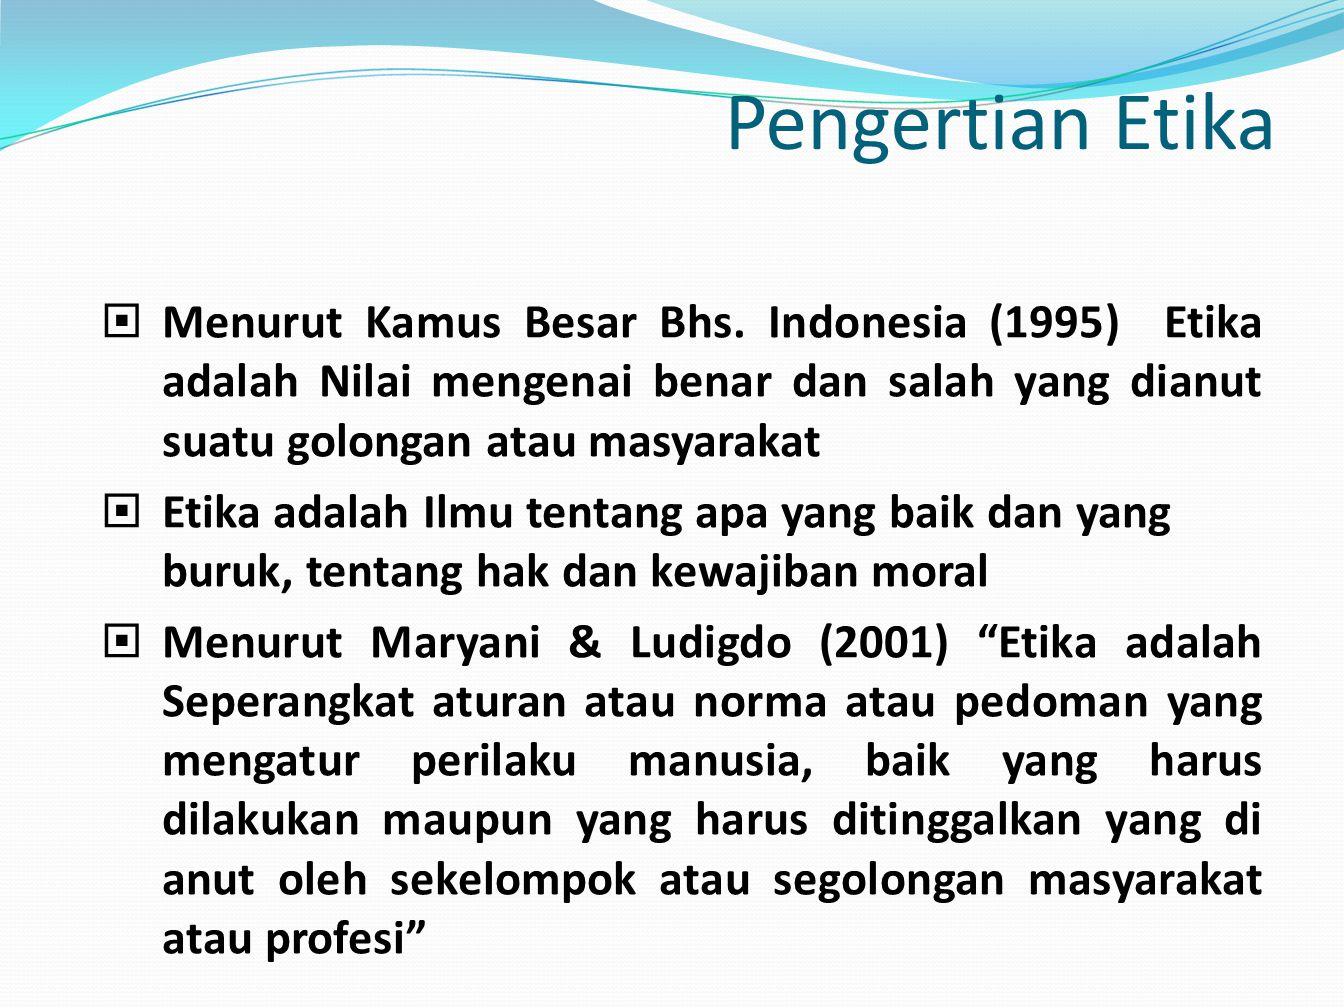 Pengertian Etika Menurut Kamus Besar Bhs. Indonesia (1995) Etika adalah Nilai mengenai benar dan salah yang dianut suatu golongan atau masyarakat.